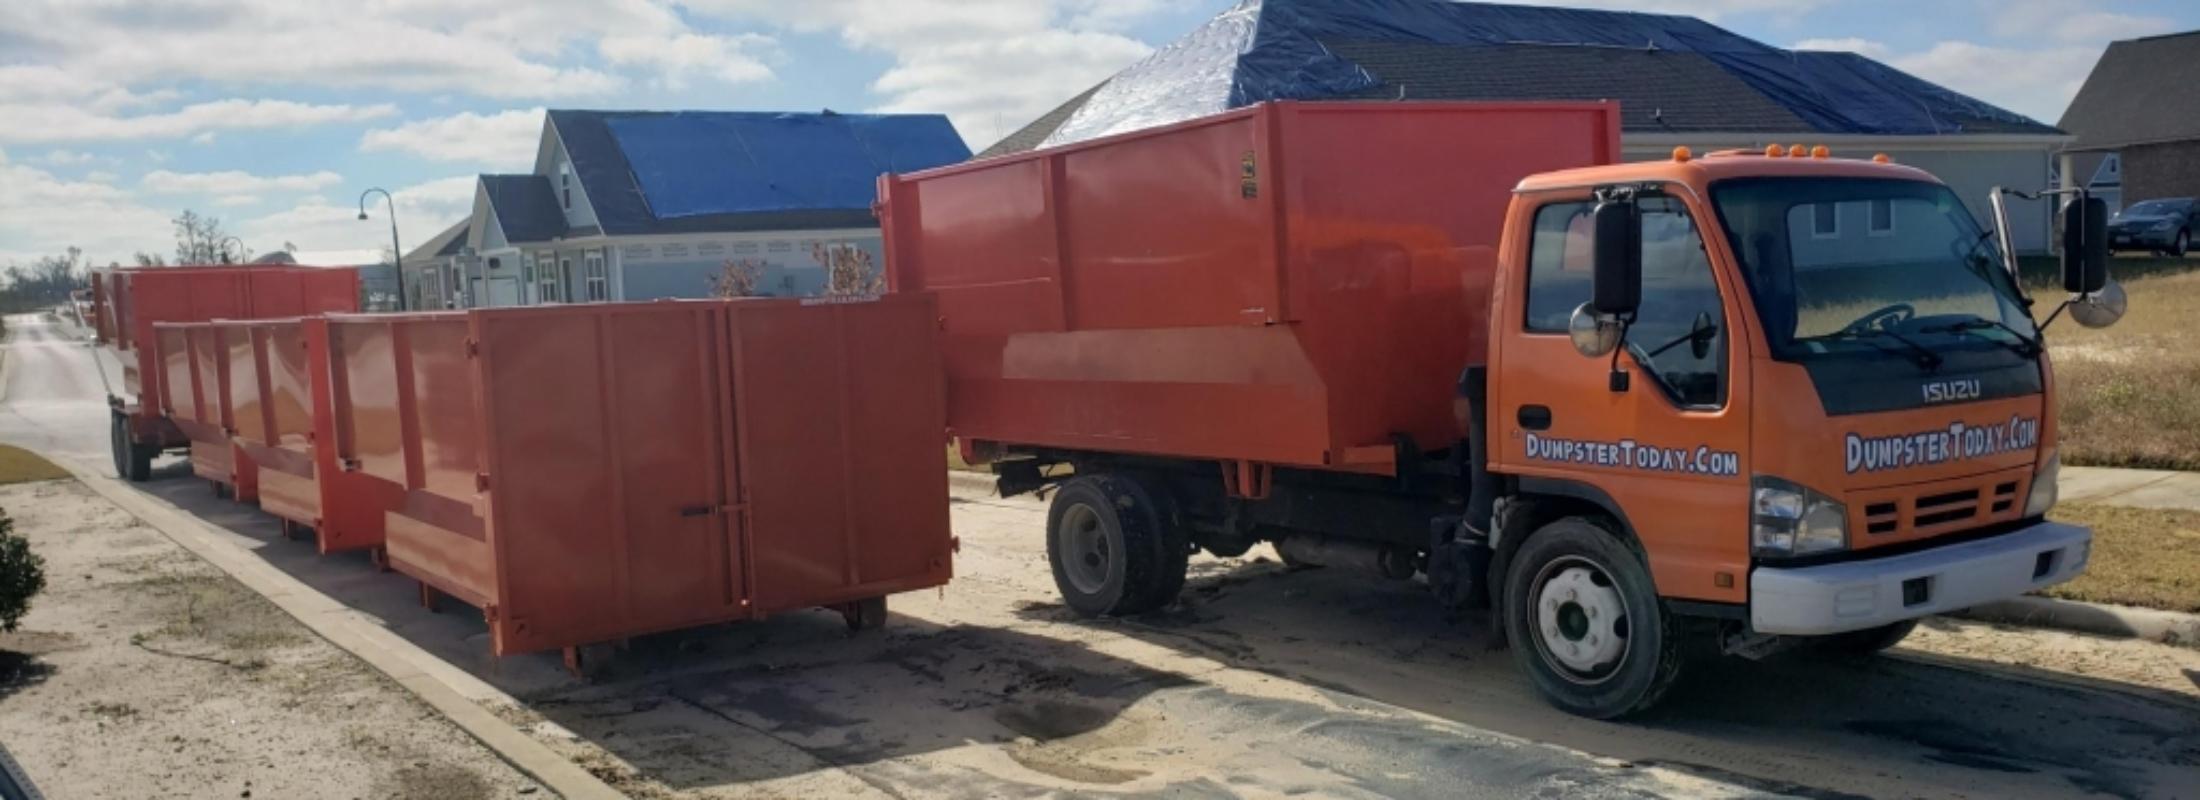 same-day-dumpster-delivery-orlando